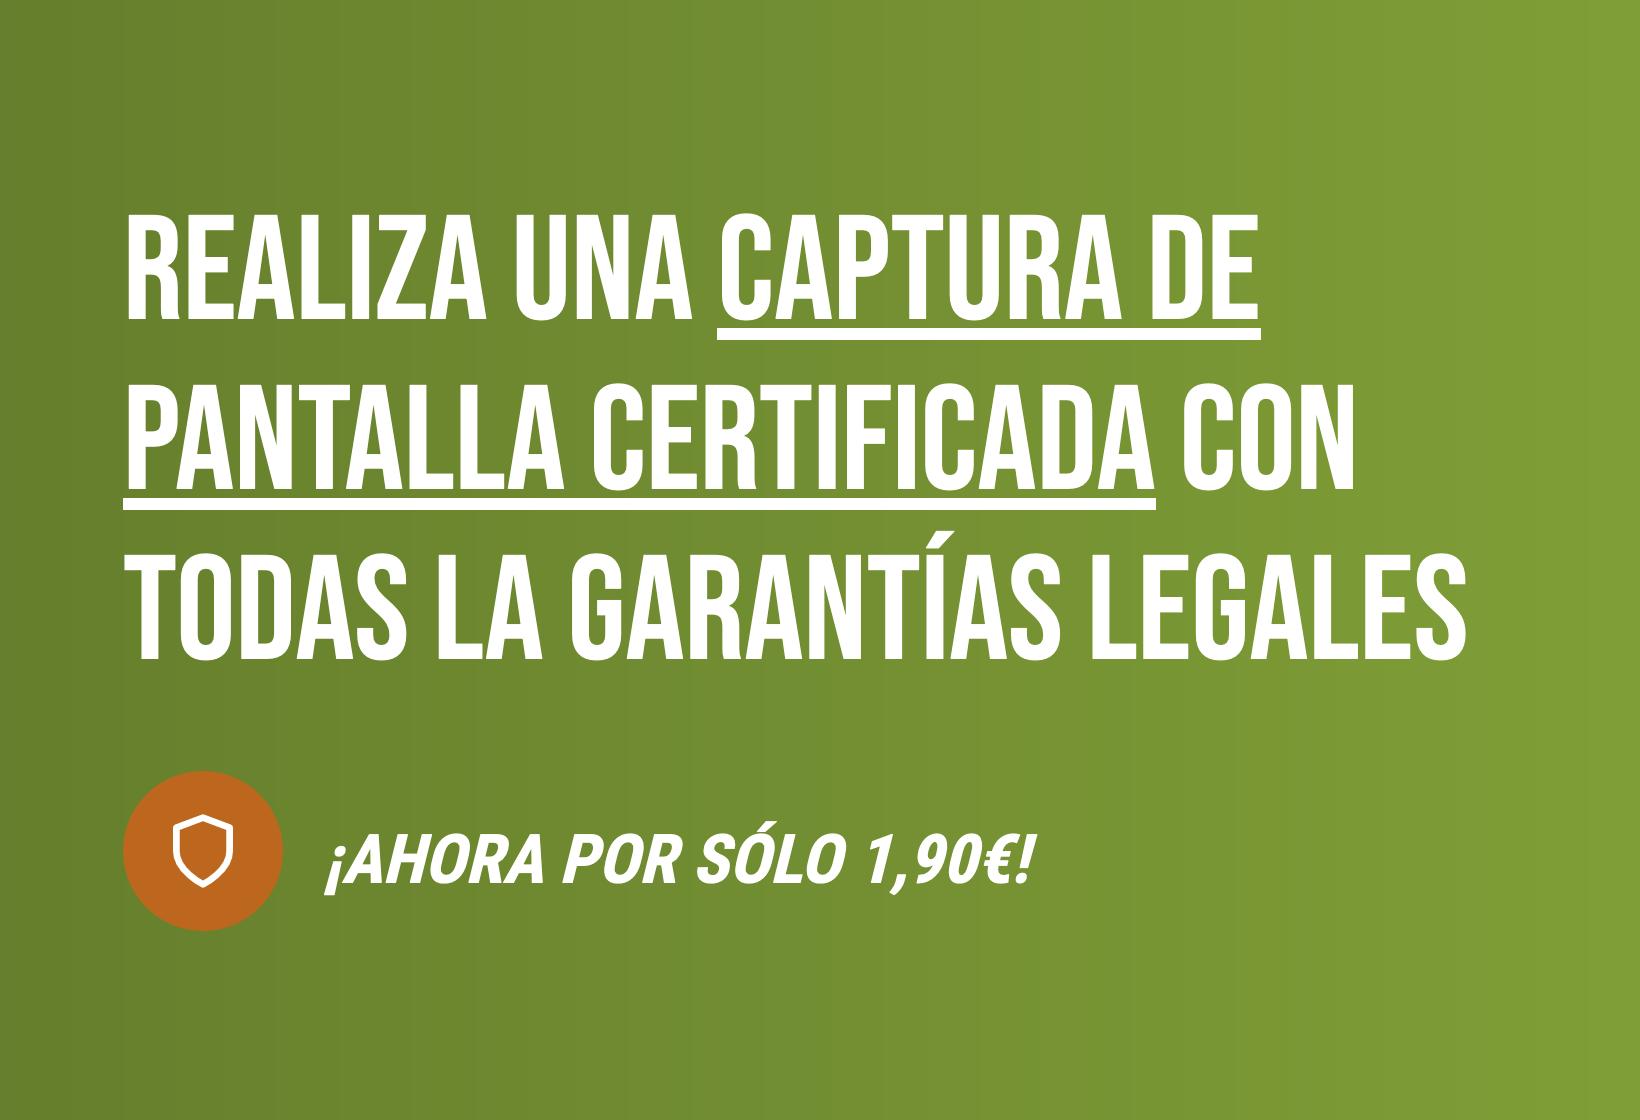 ¿Se puede presentar un pantallazo o captura de pantalla como prueba legal? según capturacertificada.es